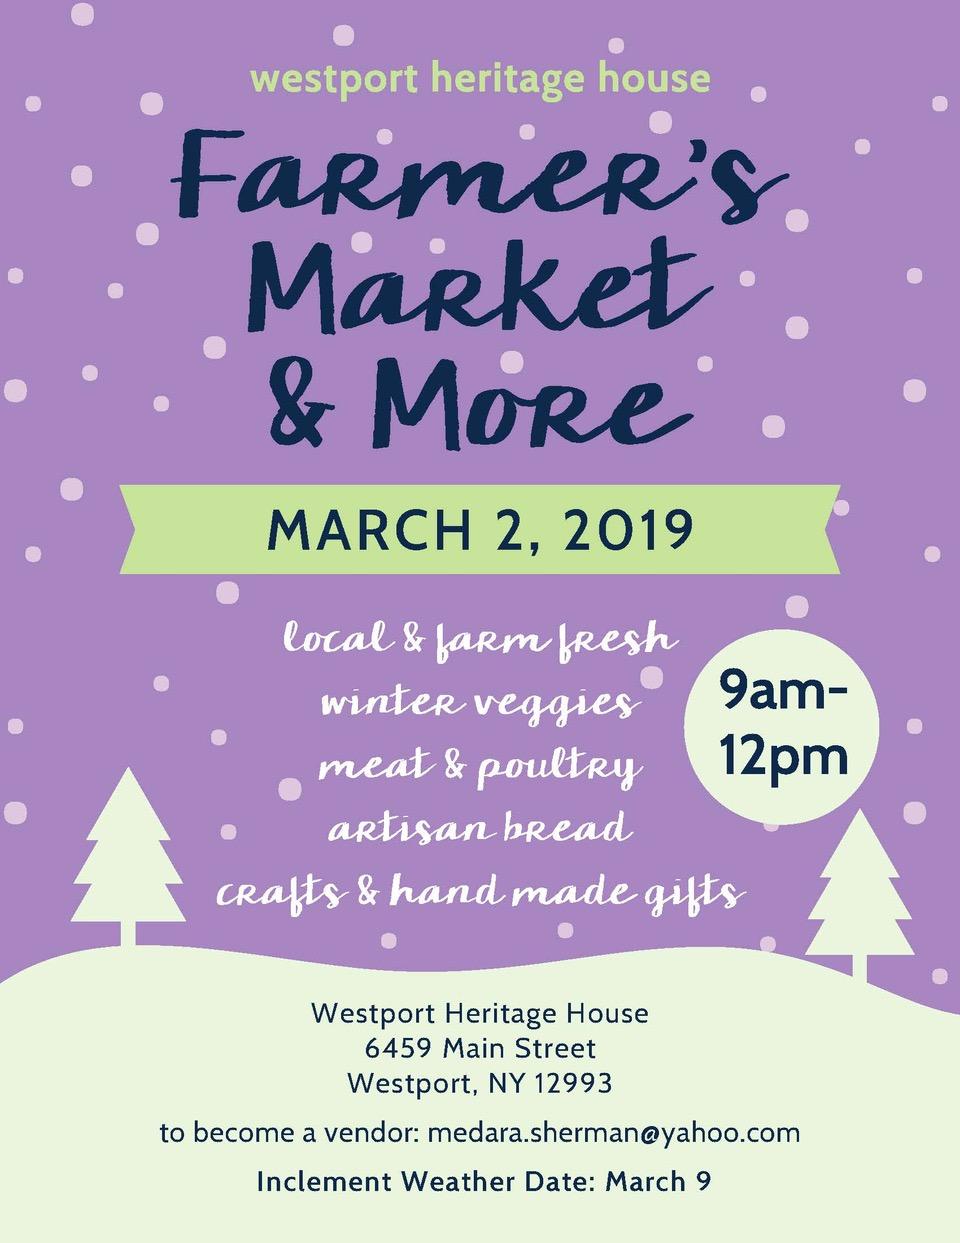 HH_FarmersMarket_Mar2019.jpg